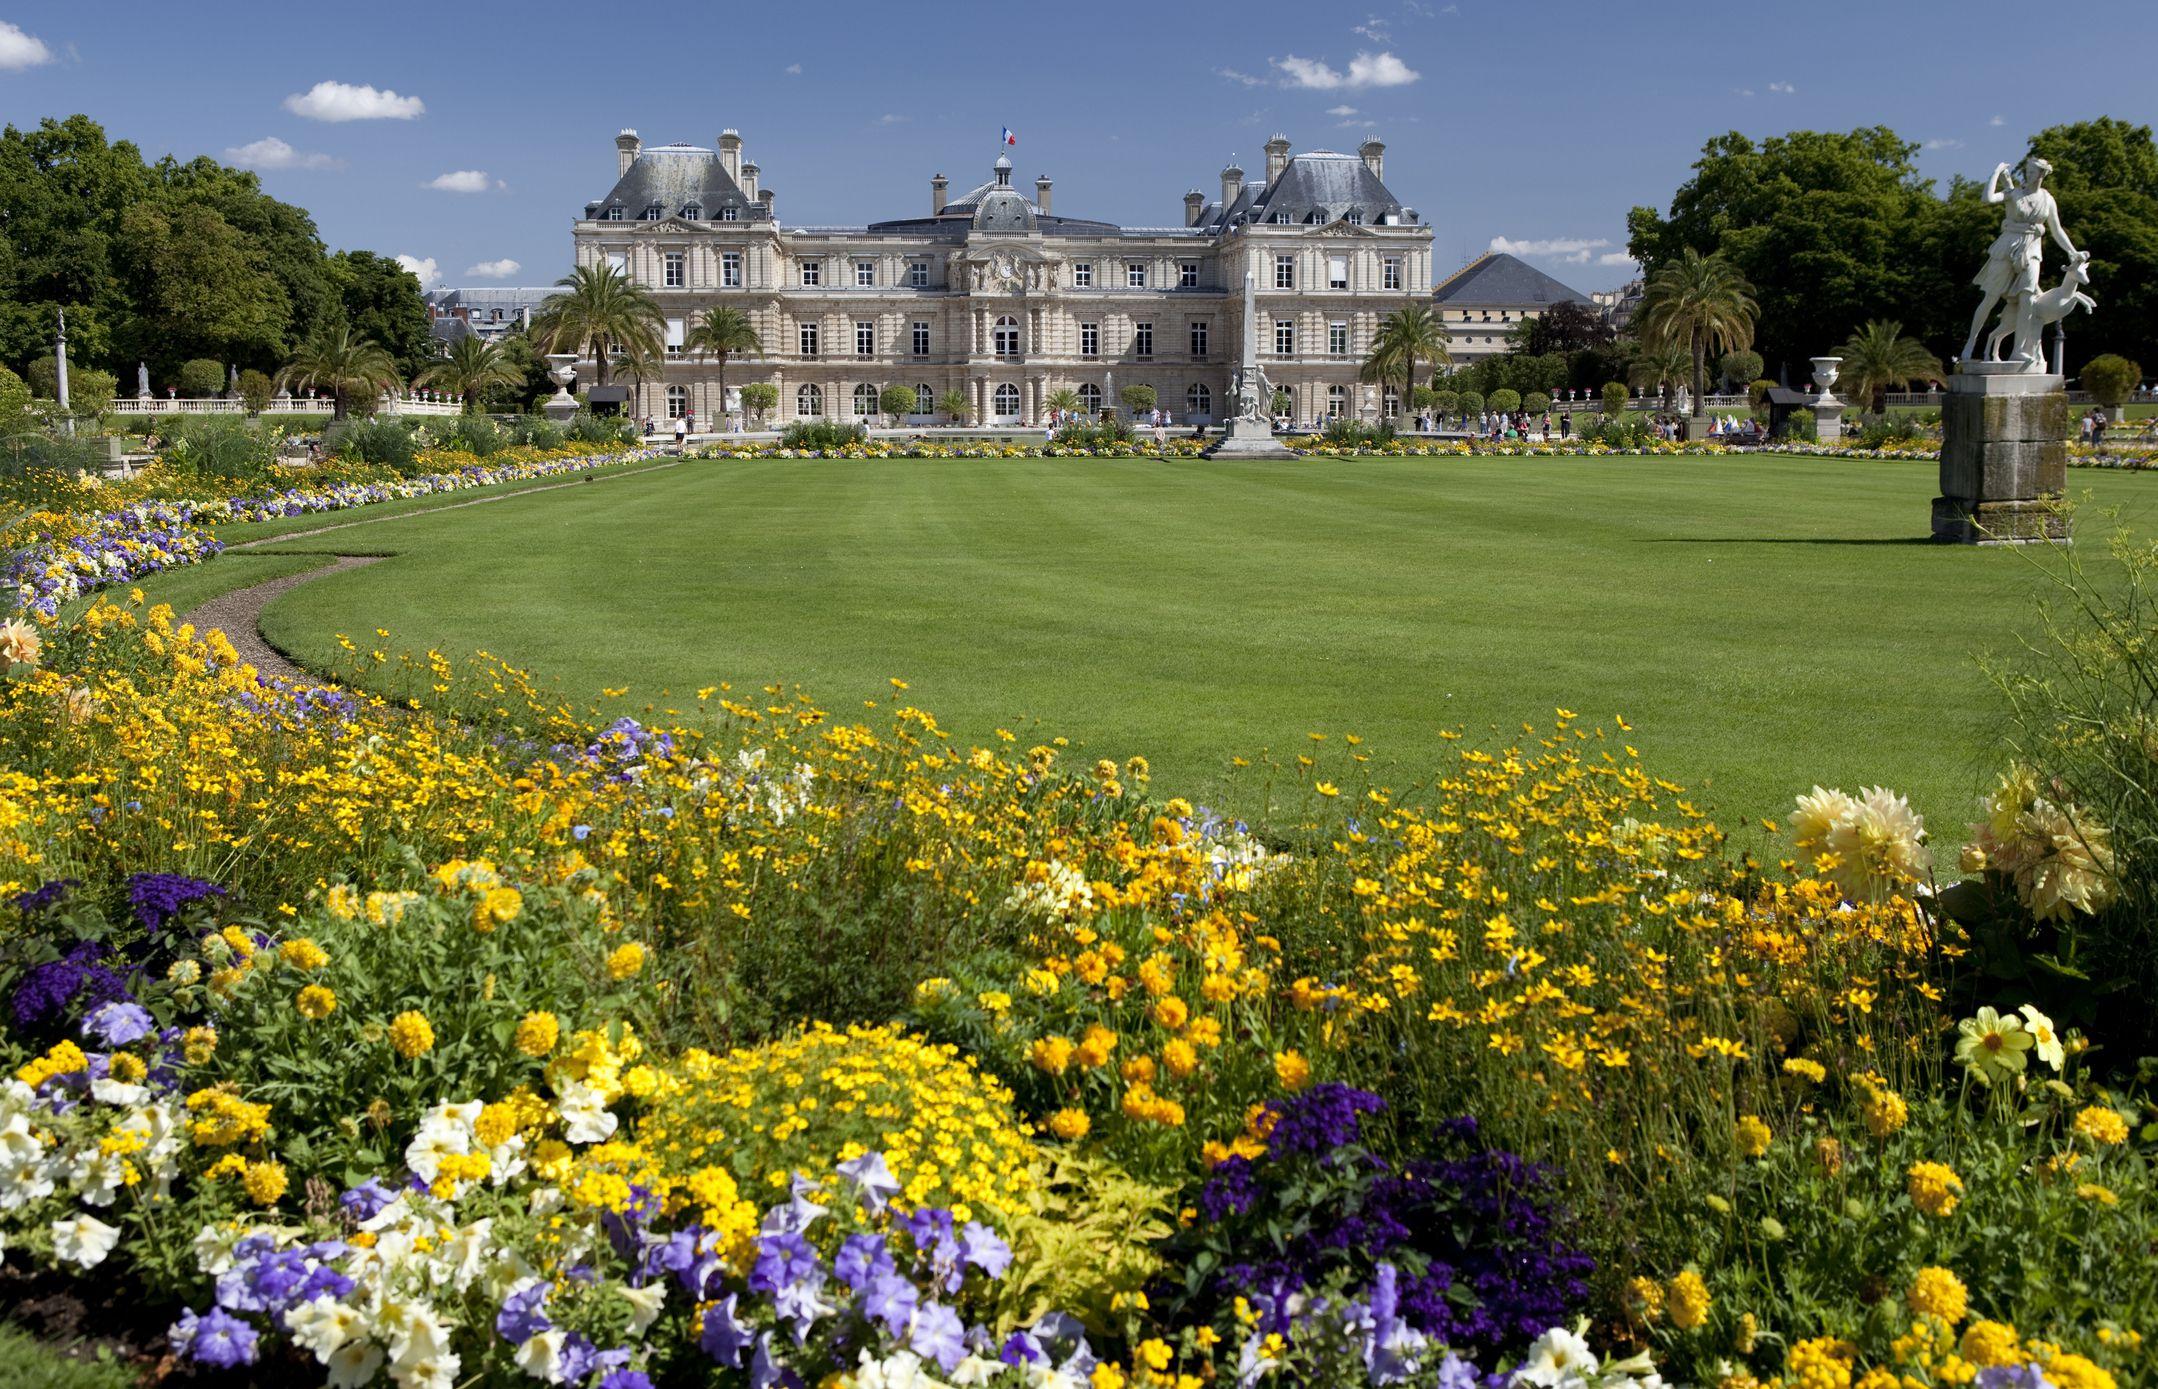 Le Jardin De Marie Unique Visitor S Guide to the Luxembourg Gardens In Paris